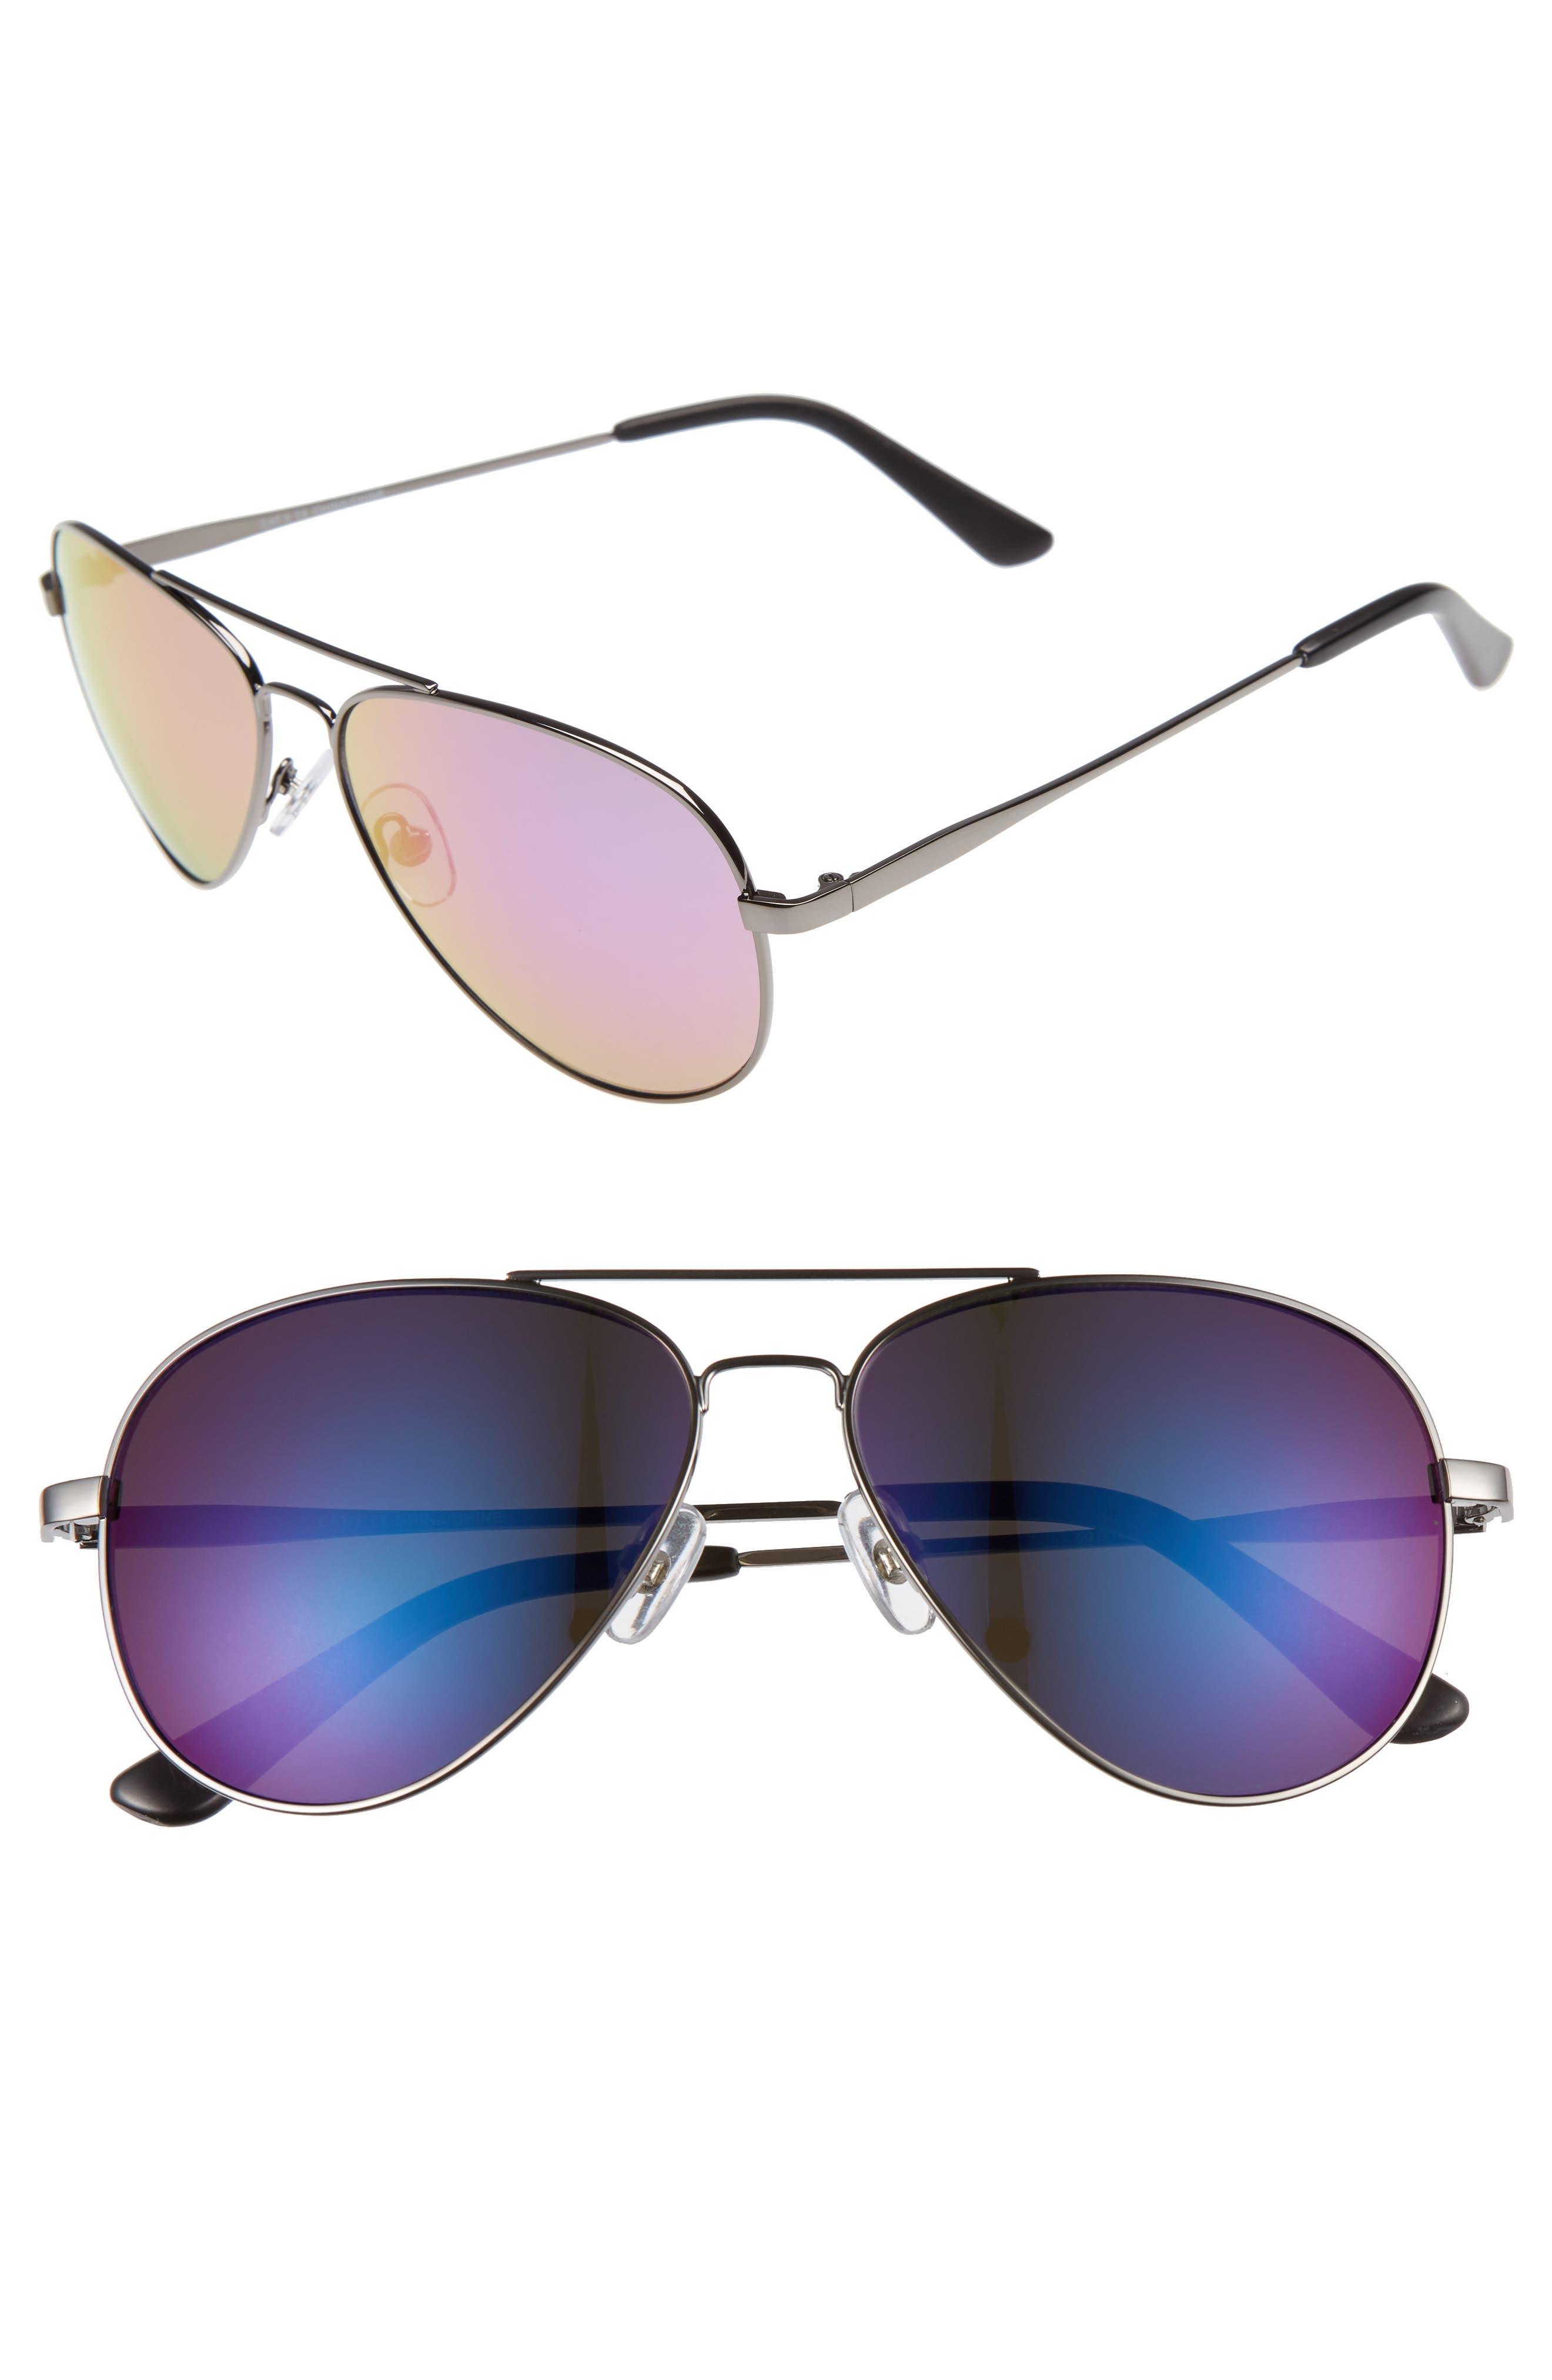 ff007e901c2 nike glasses mens purple online   OFF49% Discounts